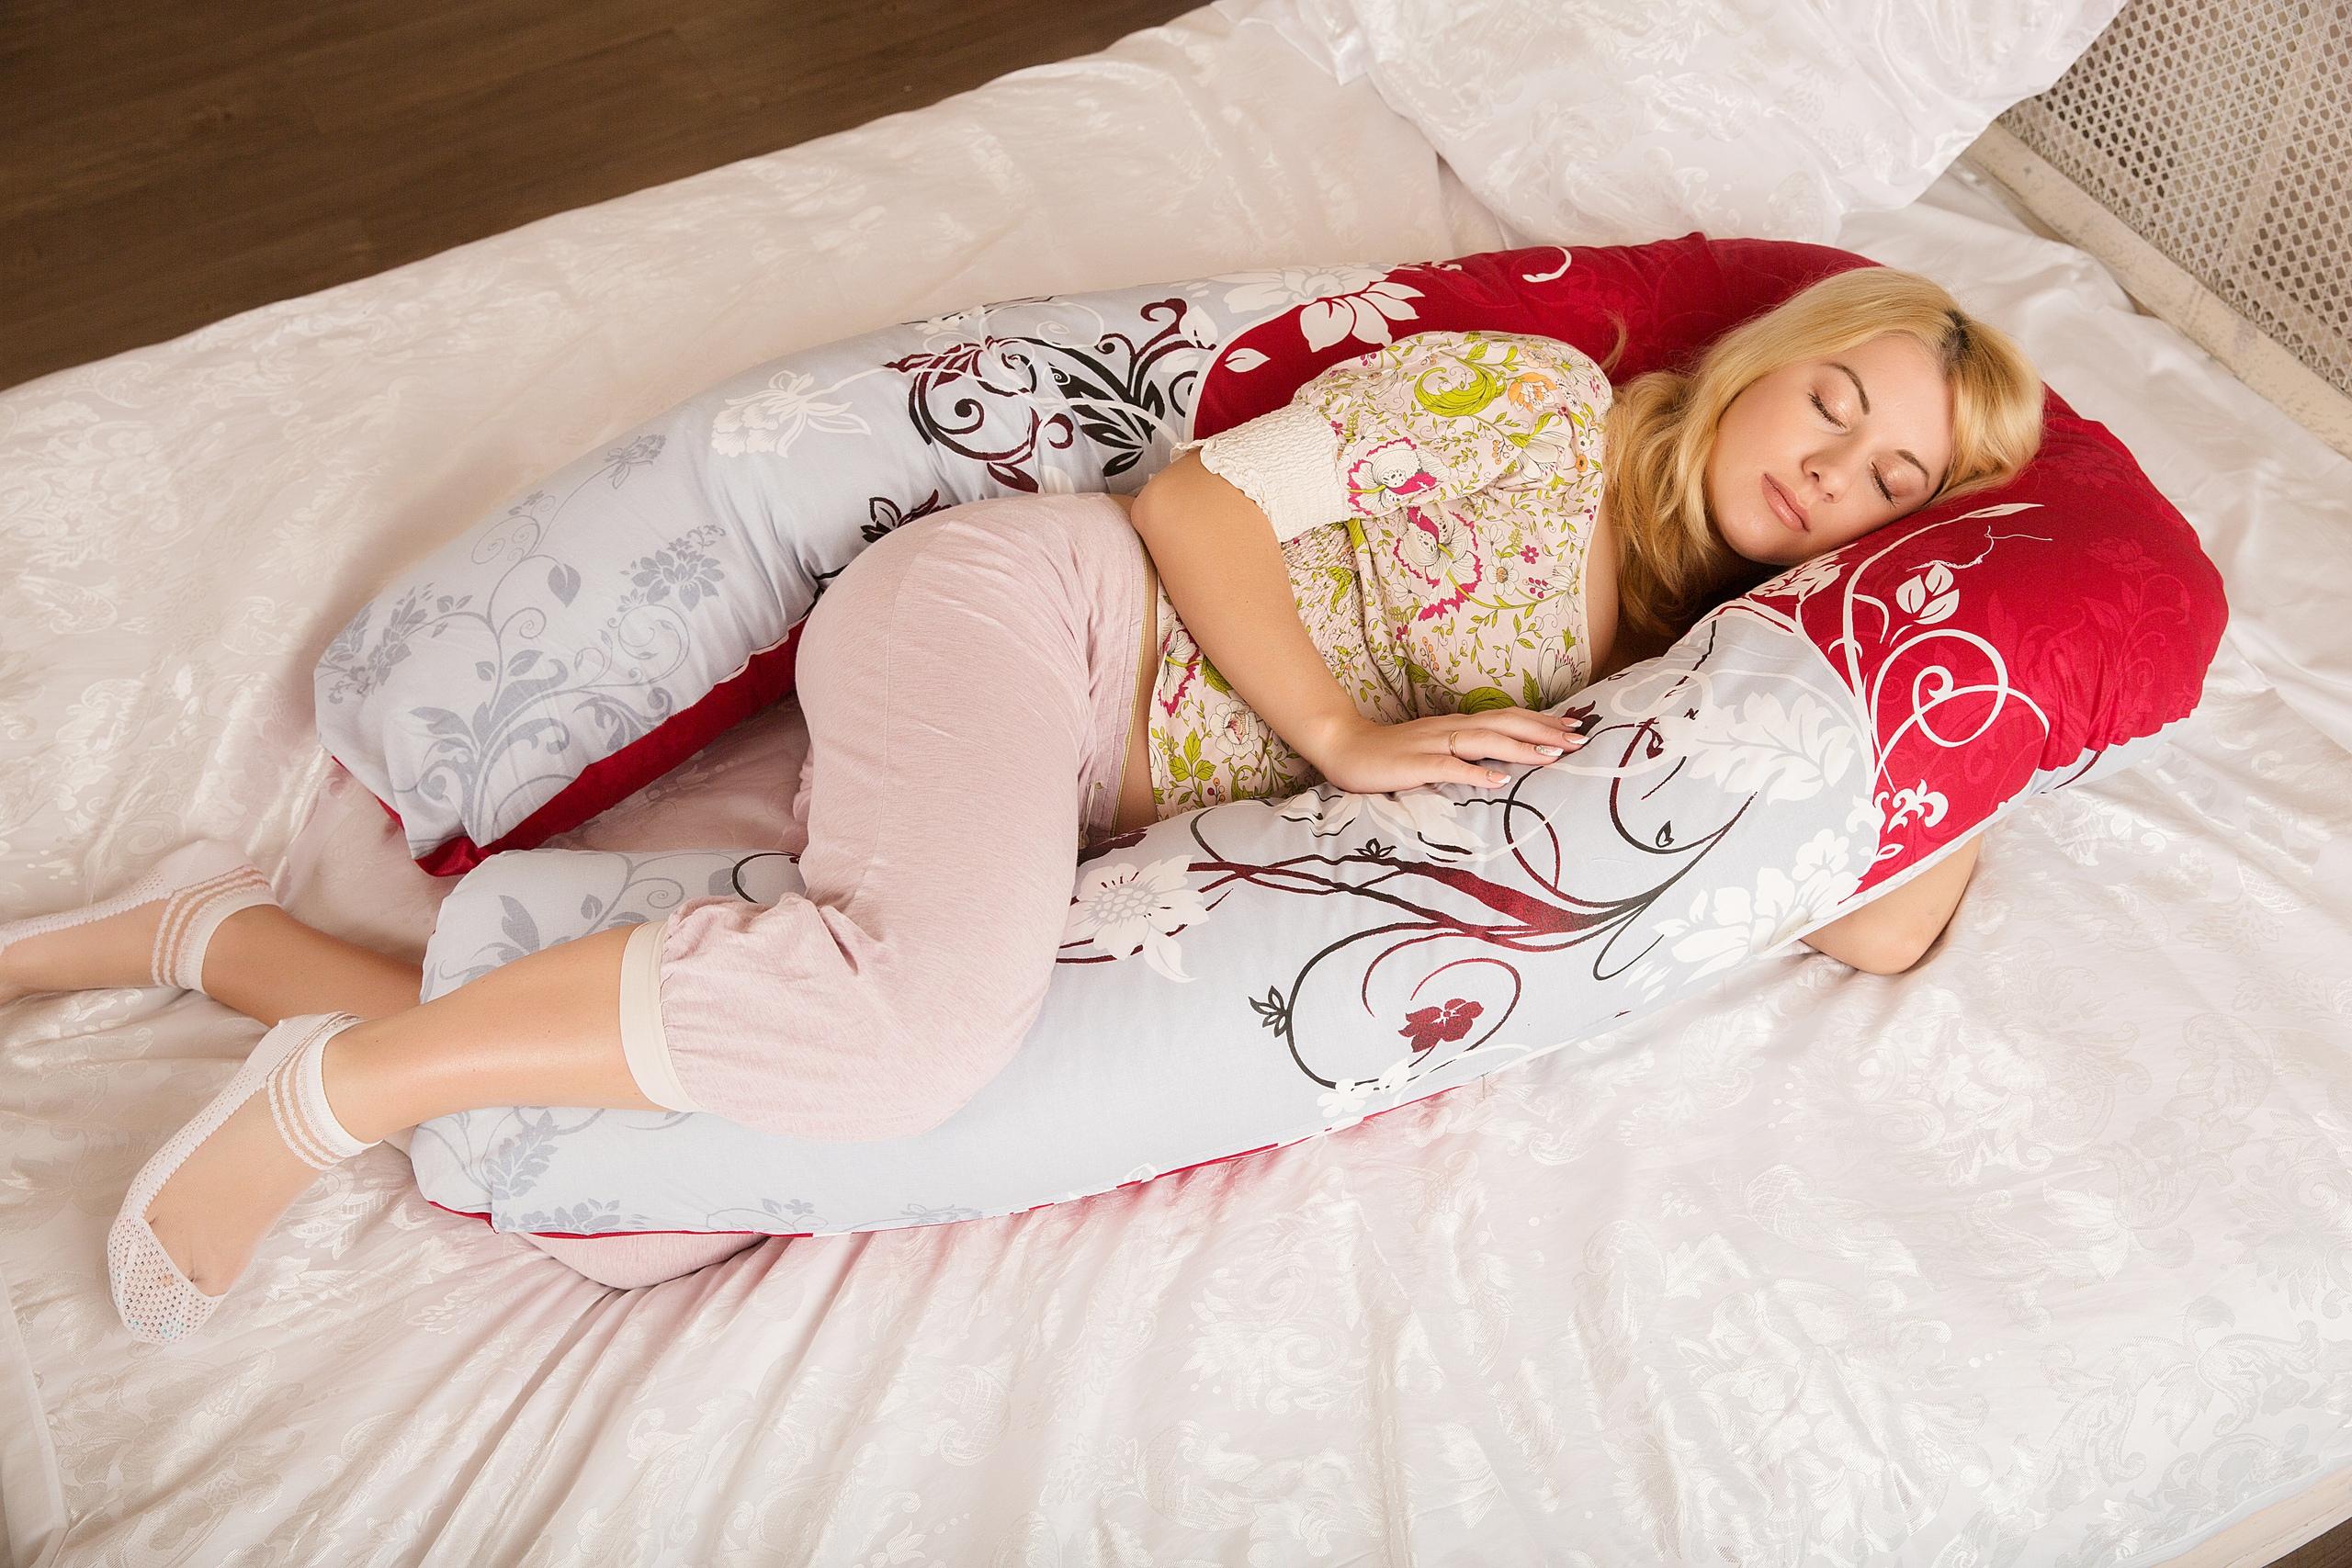 Удобная поза для сна особенно важна для беременных!